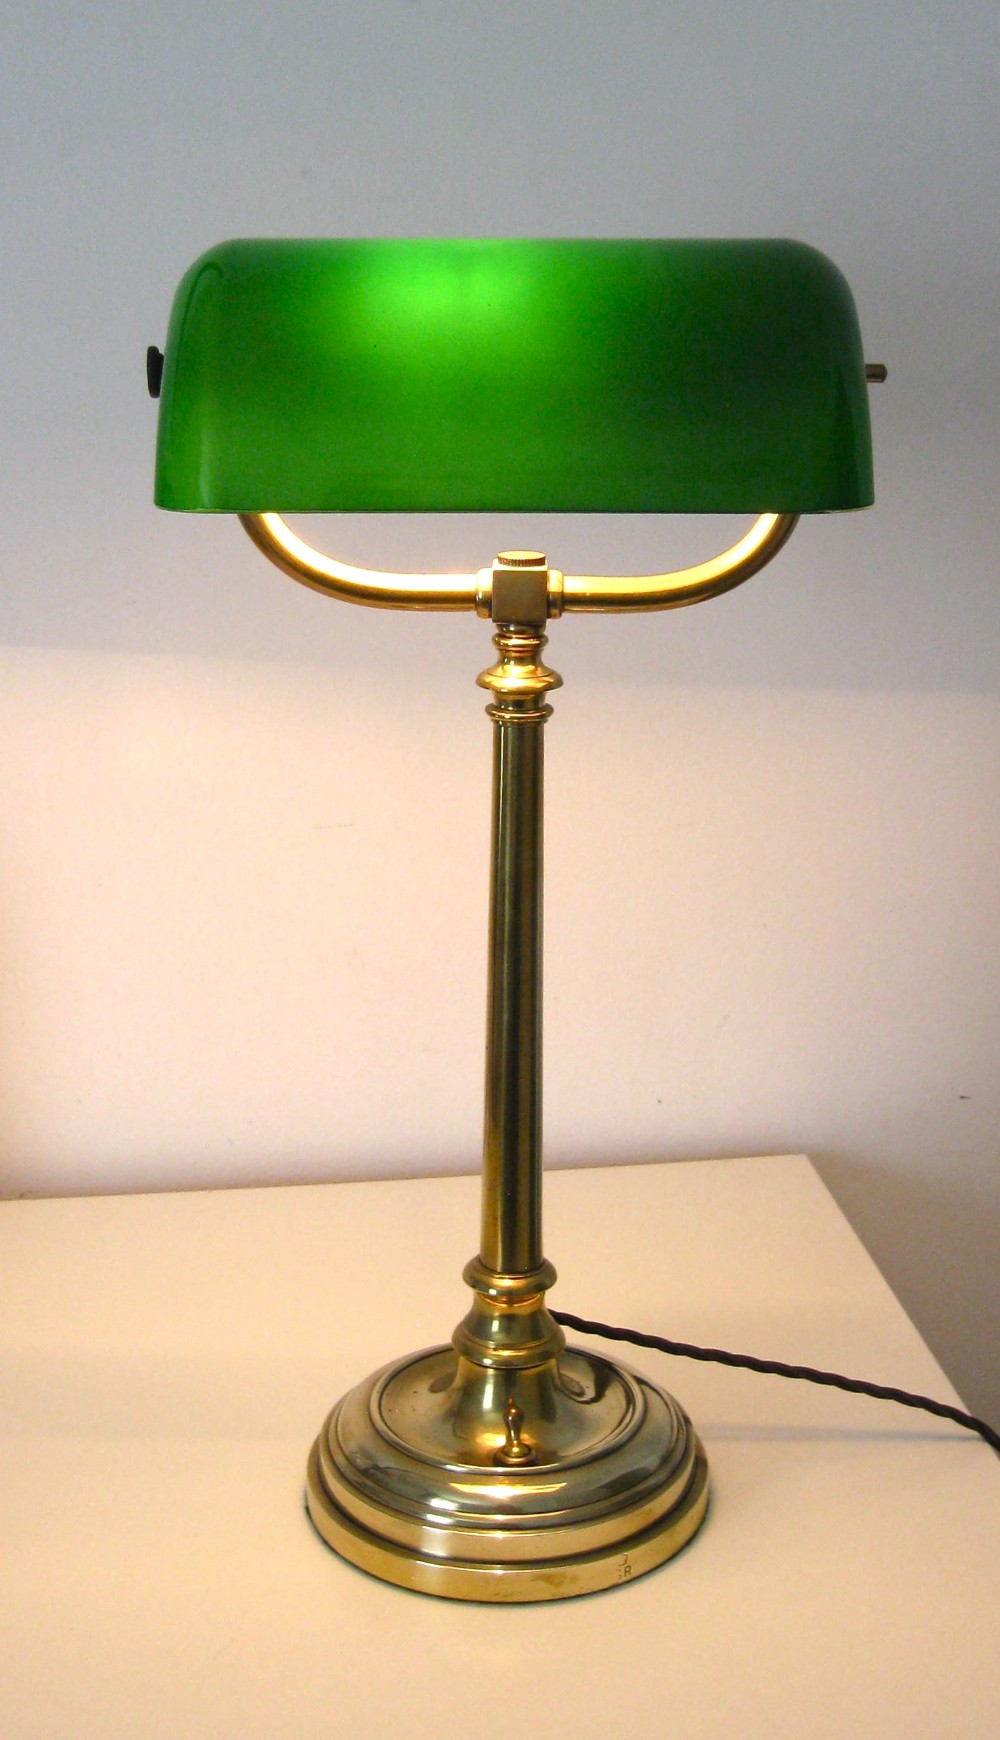 A Brass Antique Bankers Lamp 285826 Sellingantiquescouk